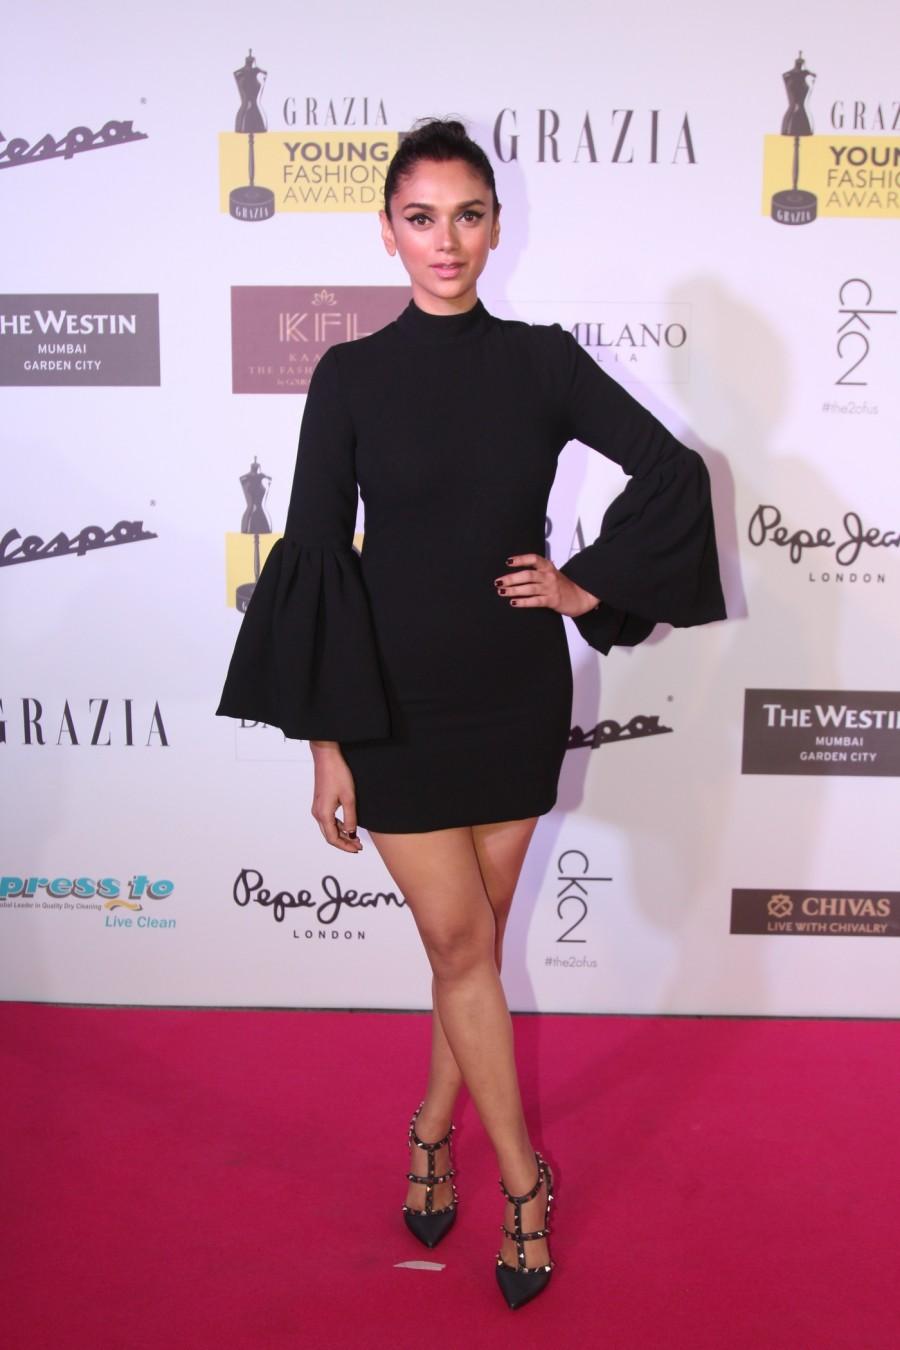 Grazia Young Fashion Awards,Grazia Young Fashion Awards 2015,Grazia Young,Sonam Kapoor,Taapsee Pannu,Sonakshi Sinha,Abhishek Kapoor,Aditi Rao Hydari,Athiya Shetty,Neha Dhupia,Raman Lamba